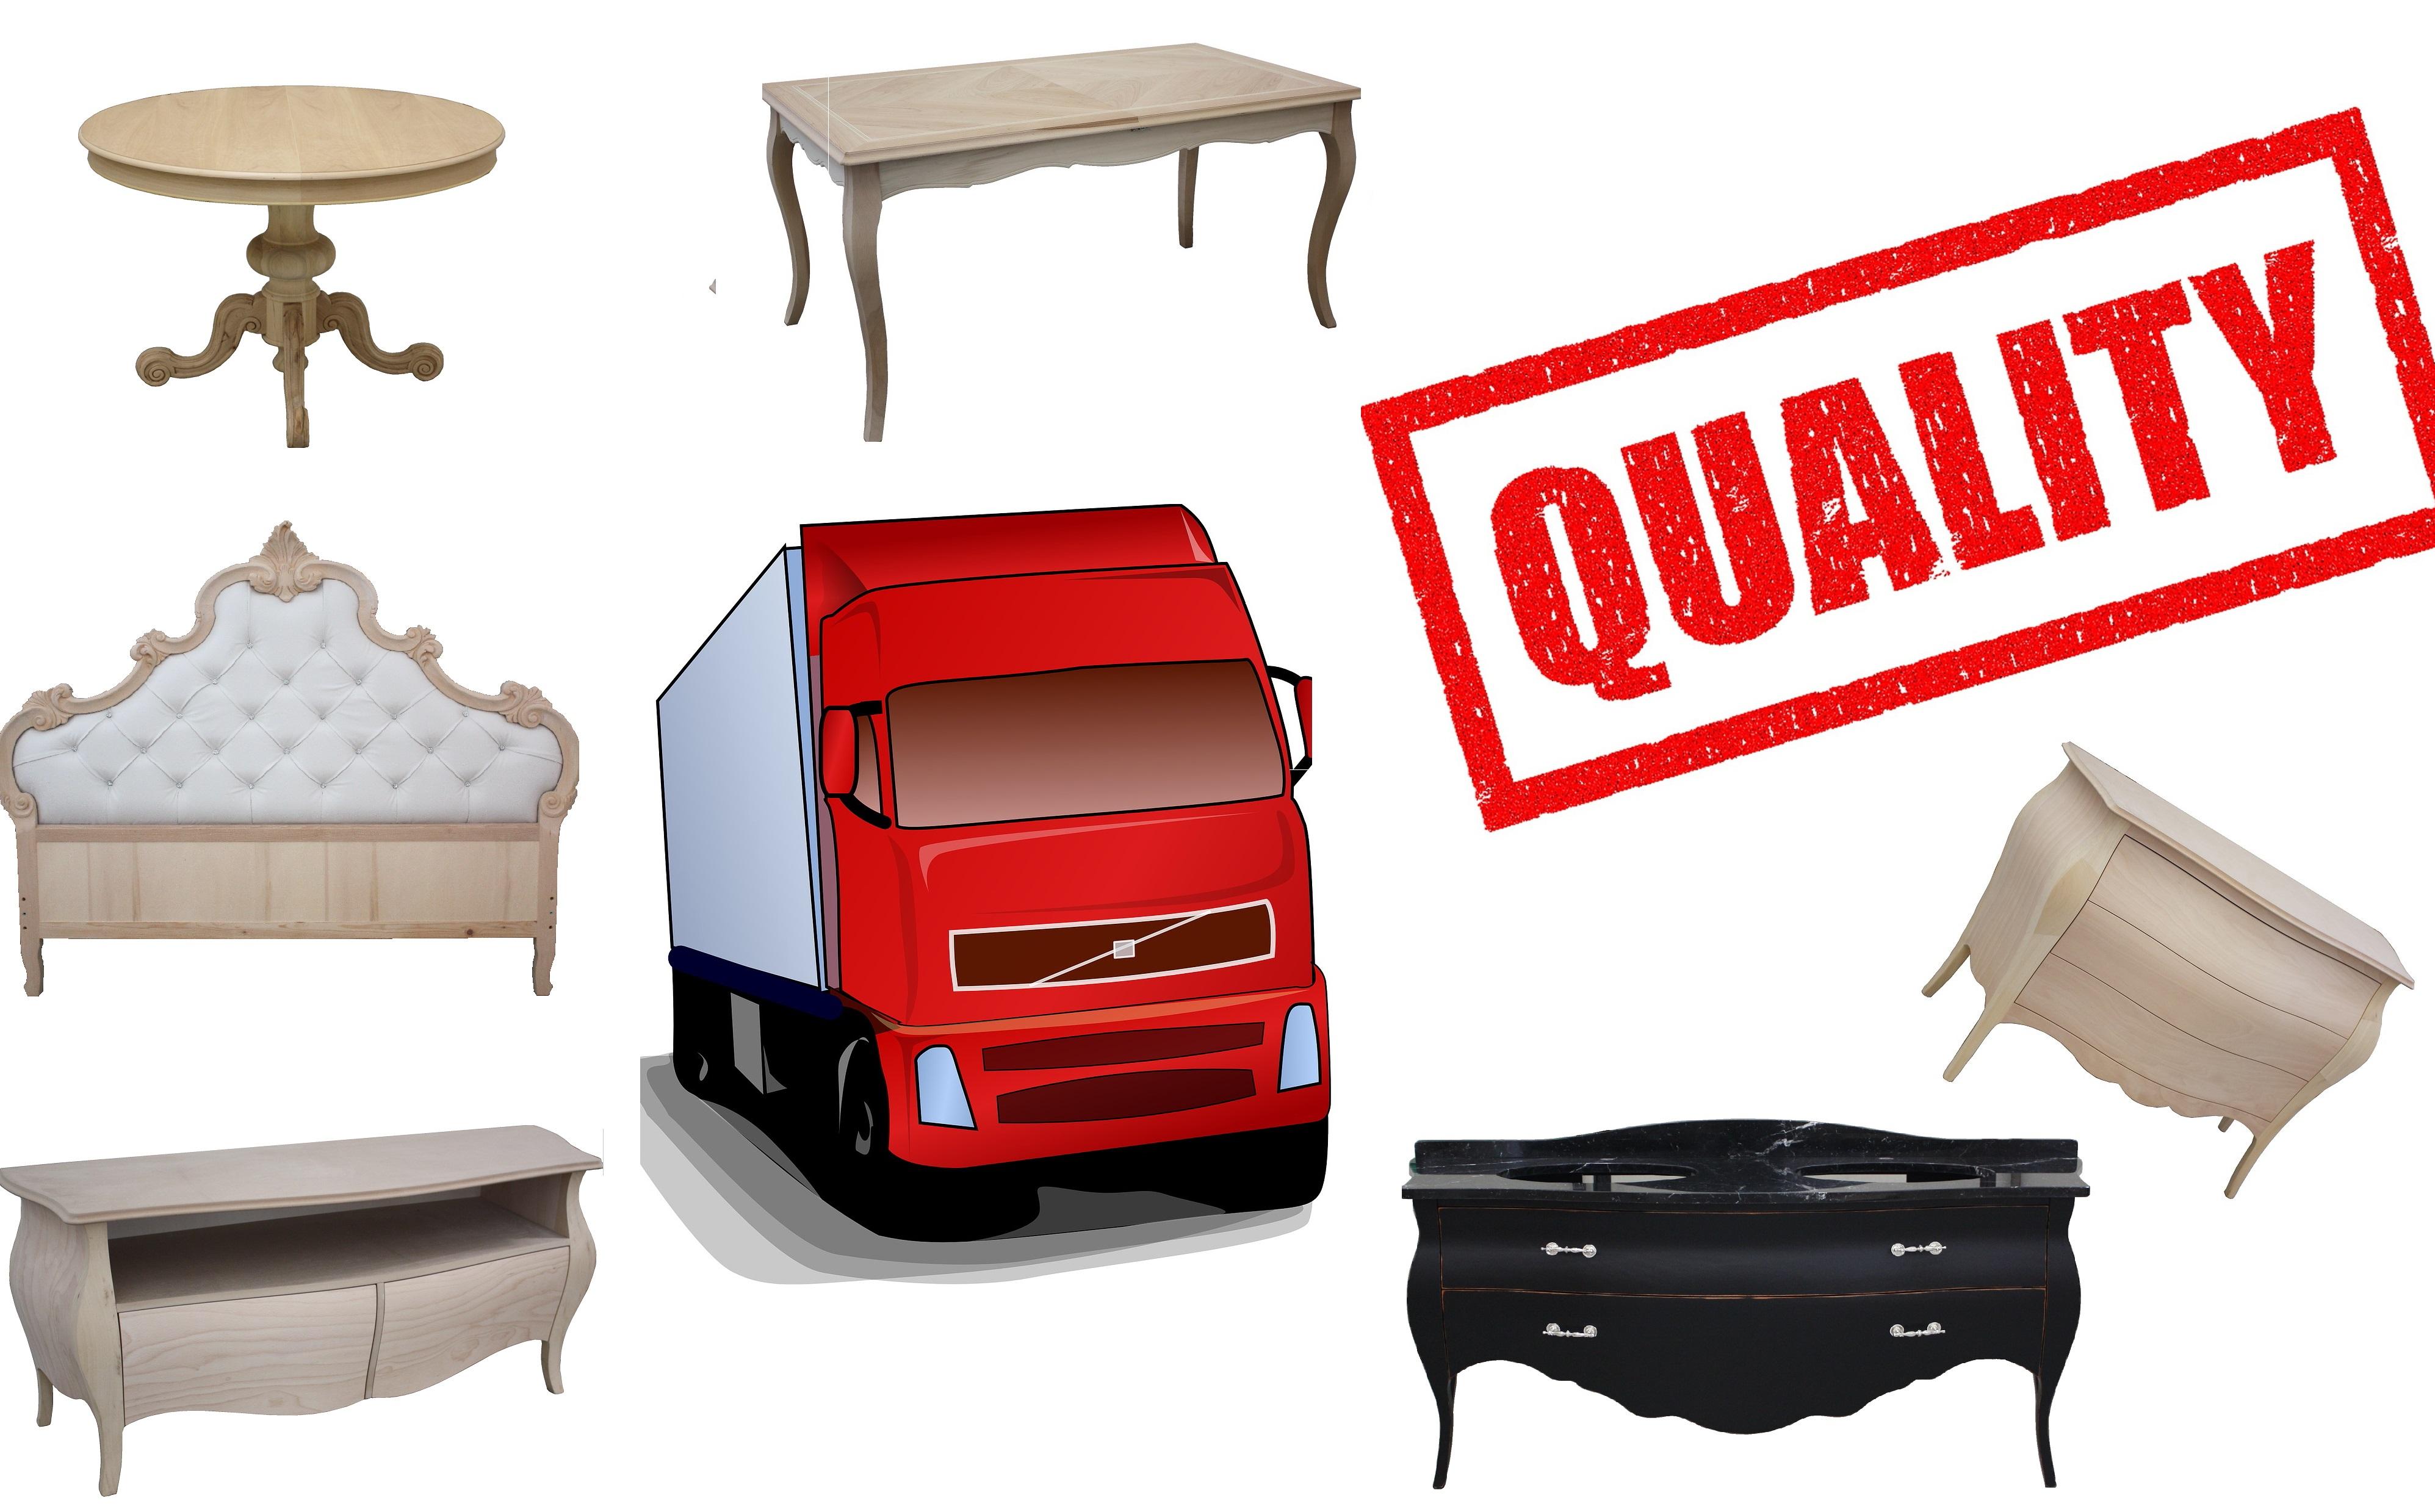 Pratelli mobili vendita online mobili grezzi e for Shop online mobili